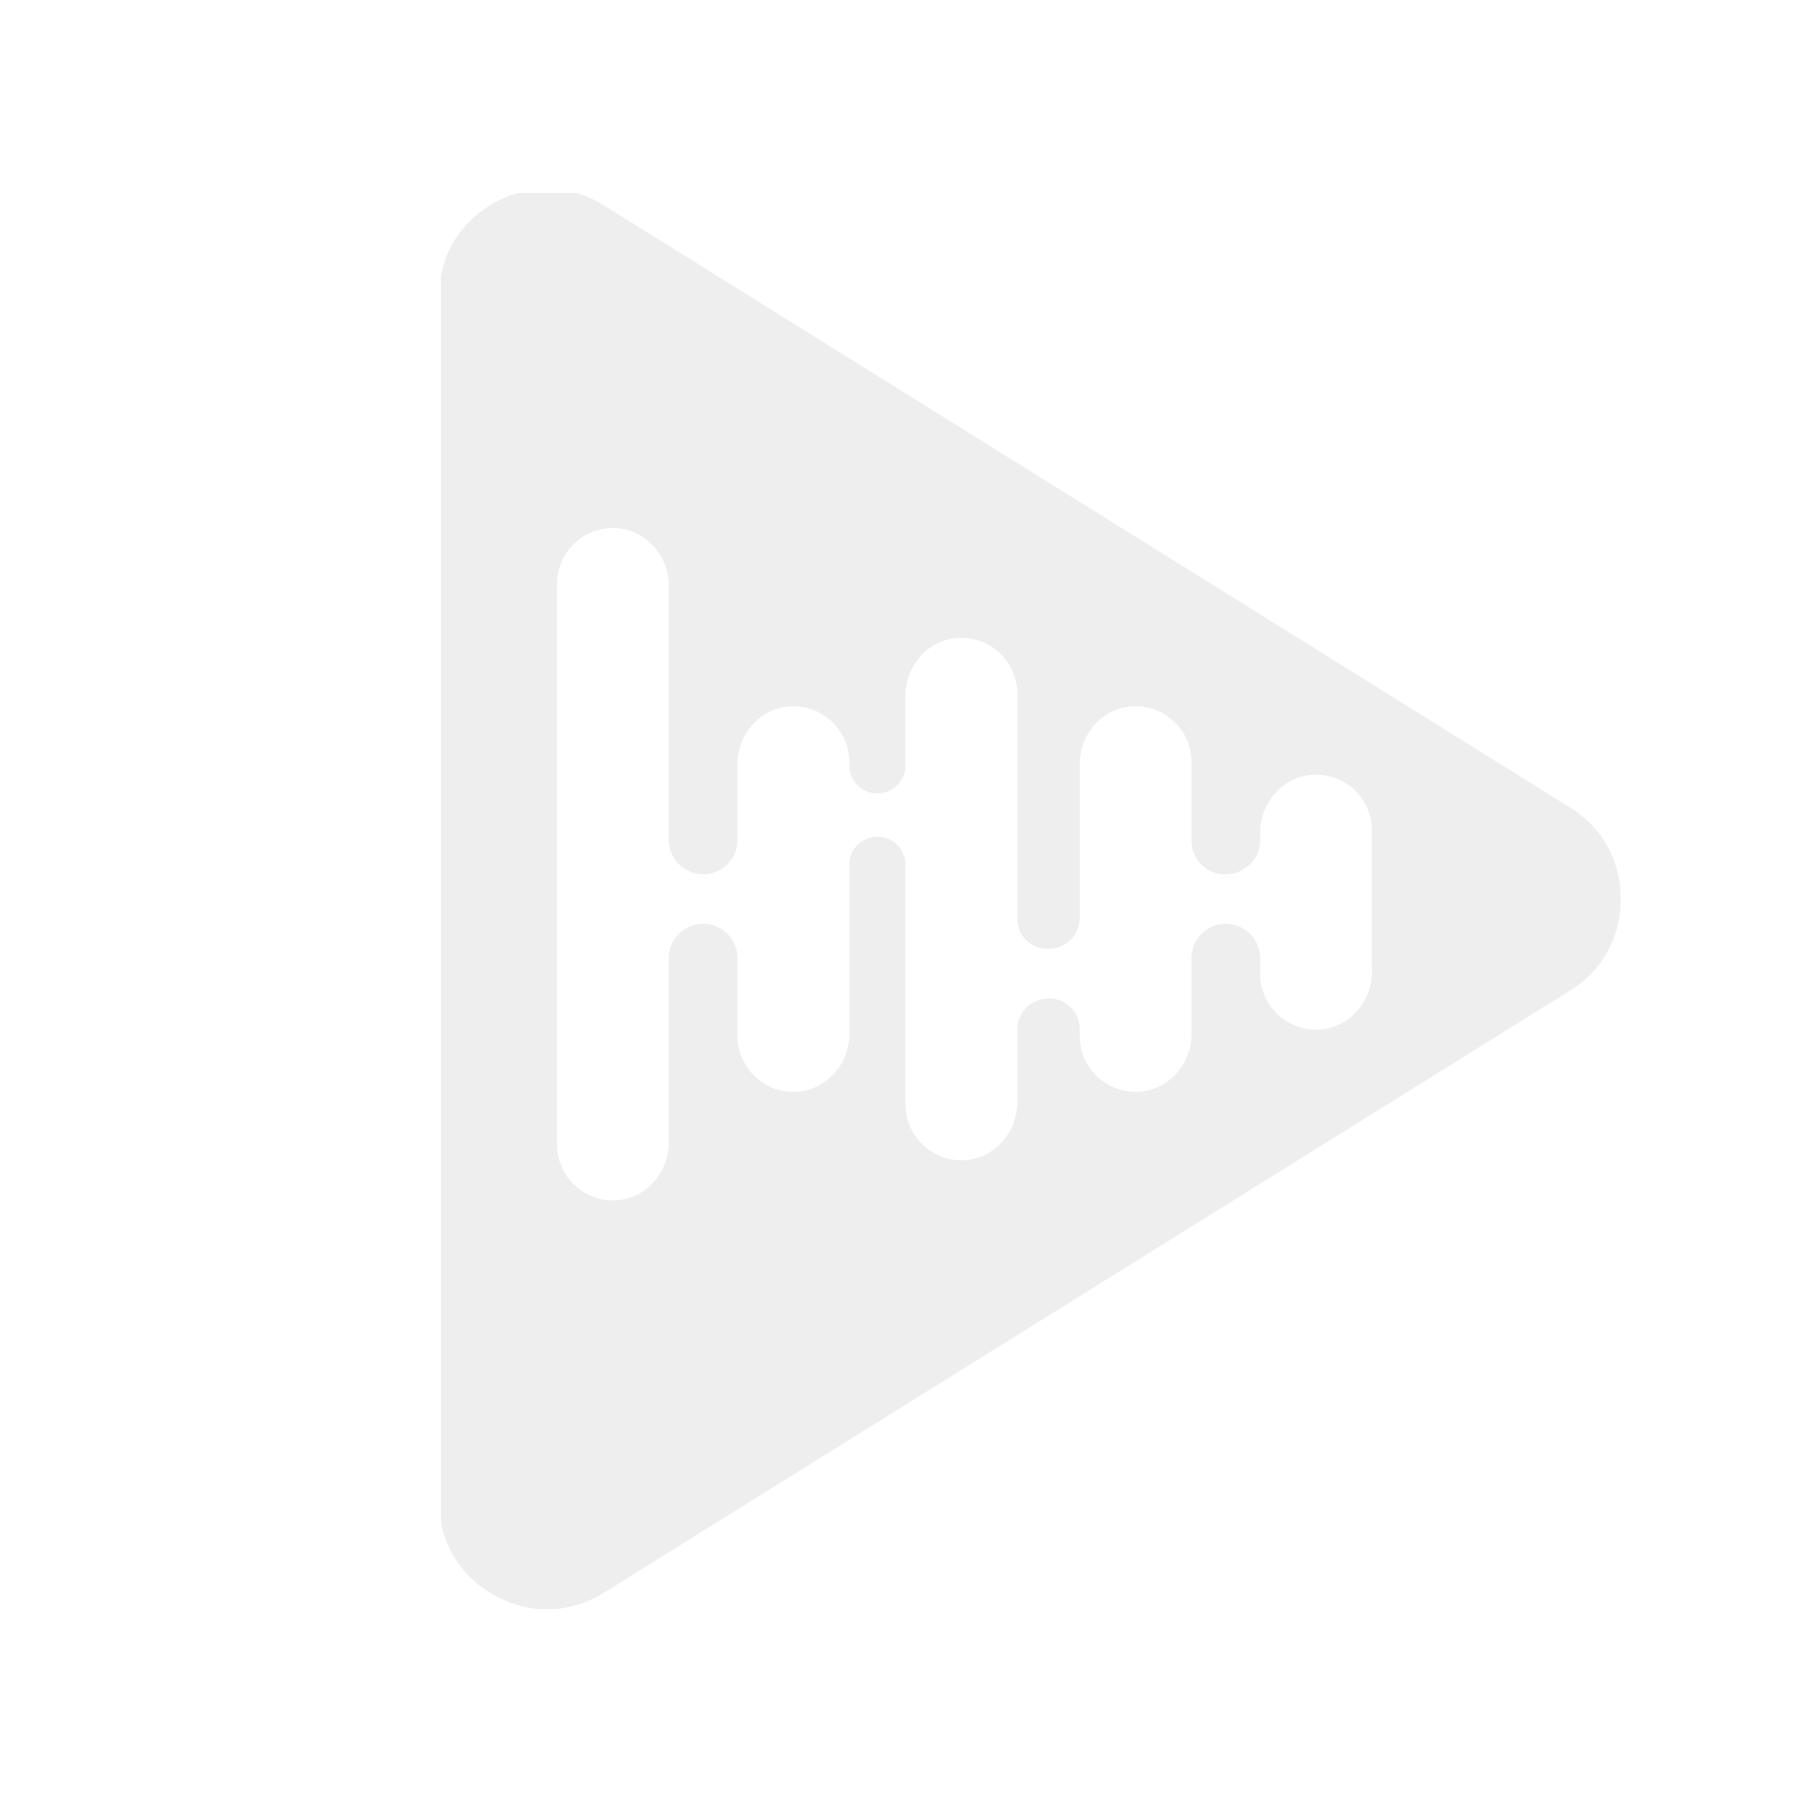 ACV 42SVW001